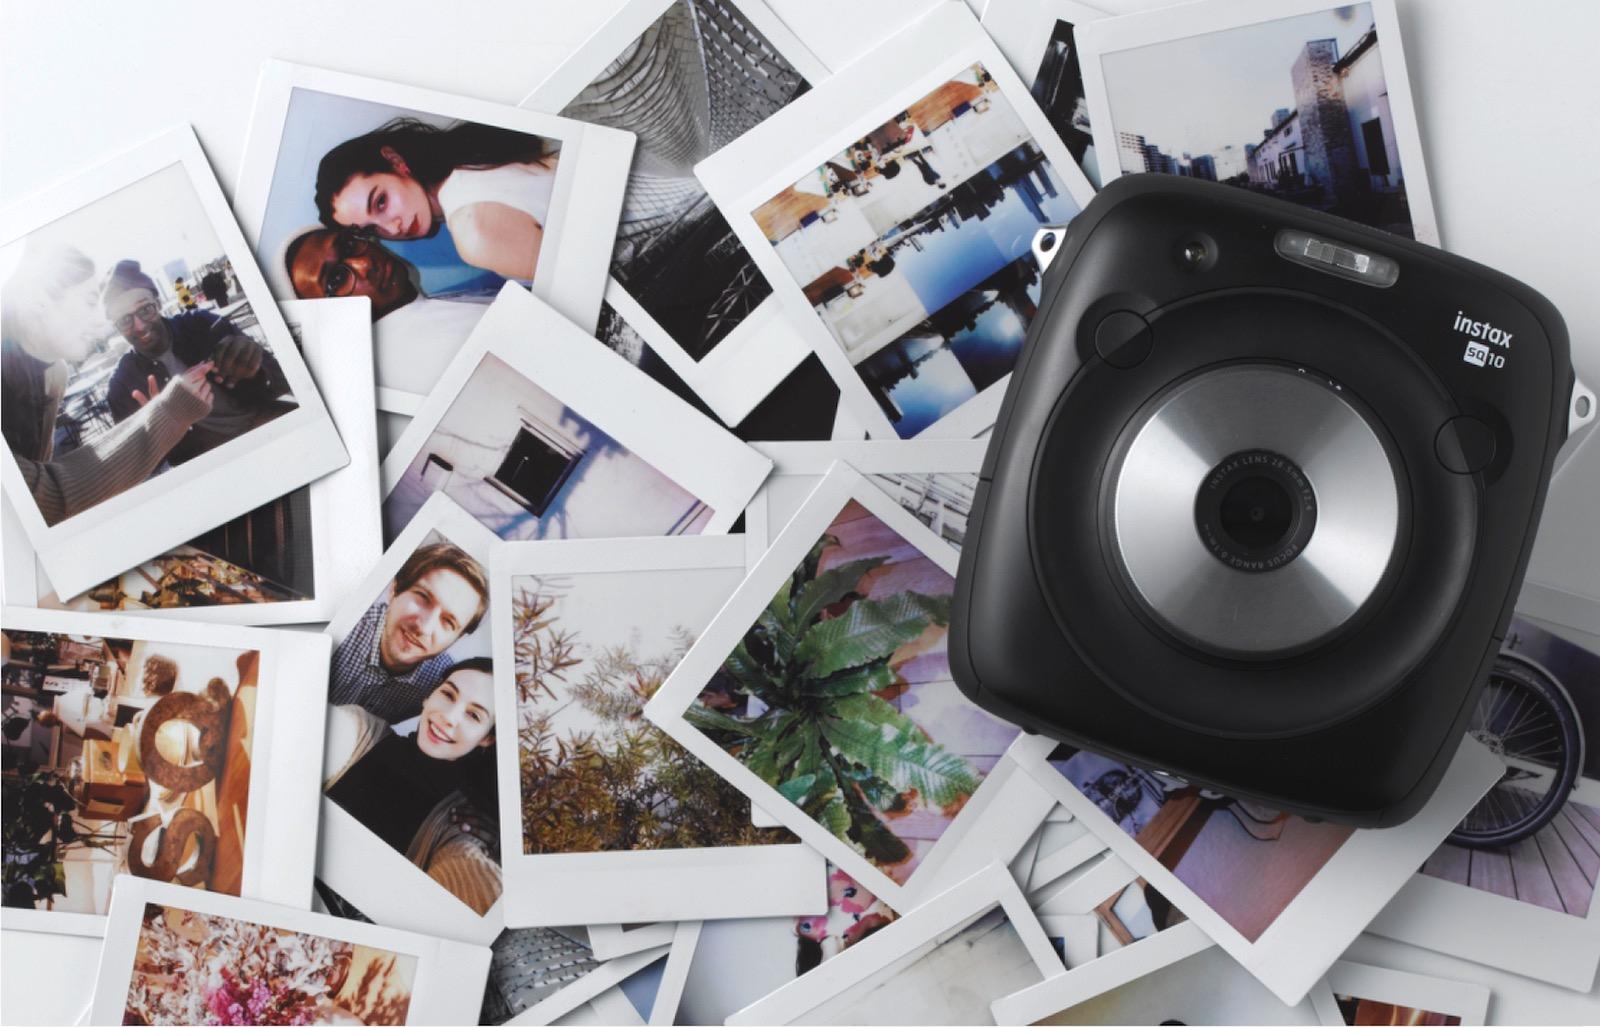 Fujifilm's new Instax camera is half digital, half instant